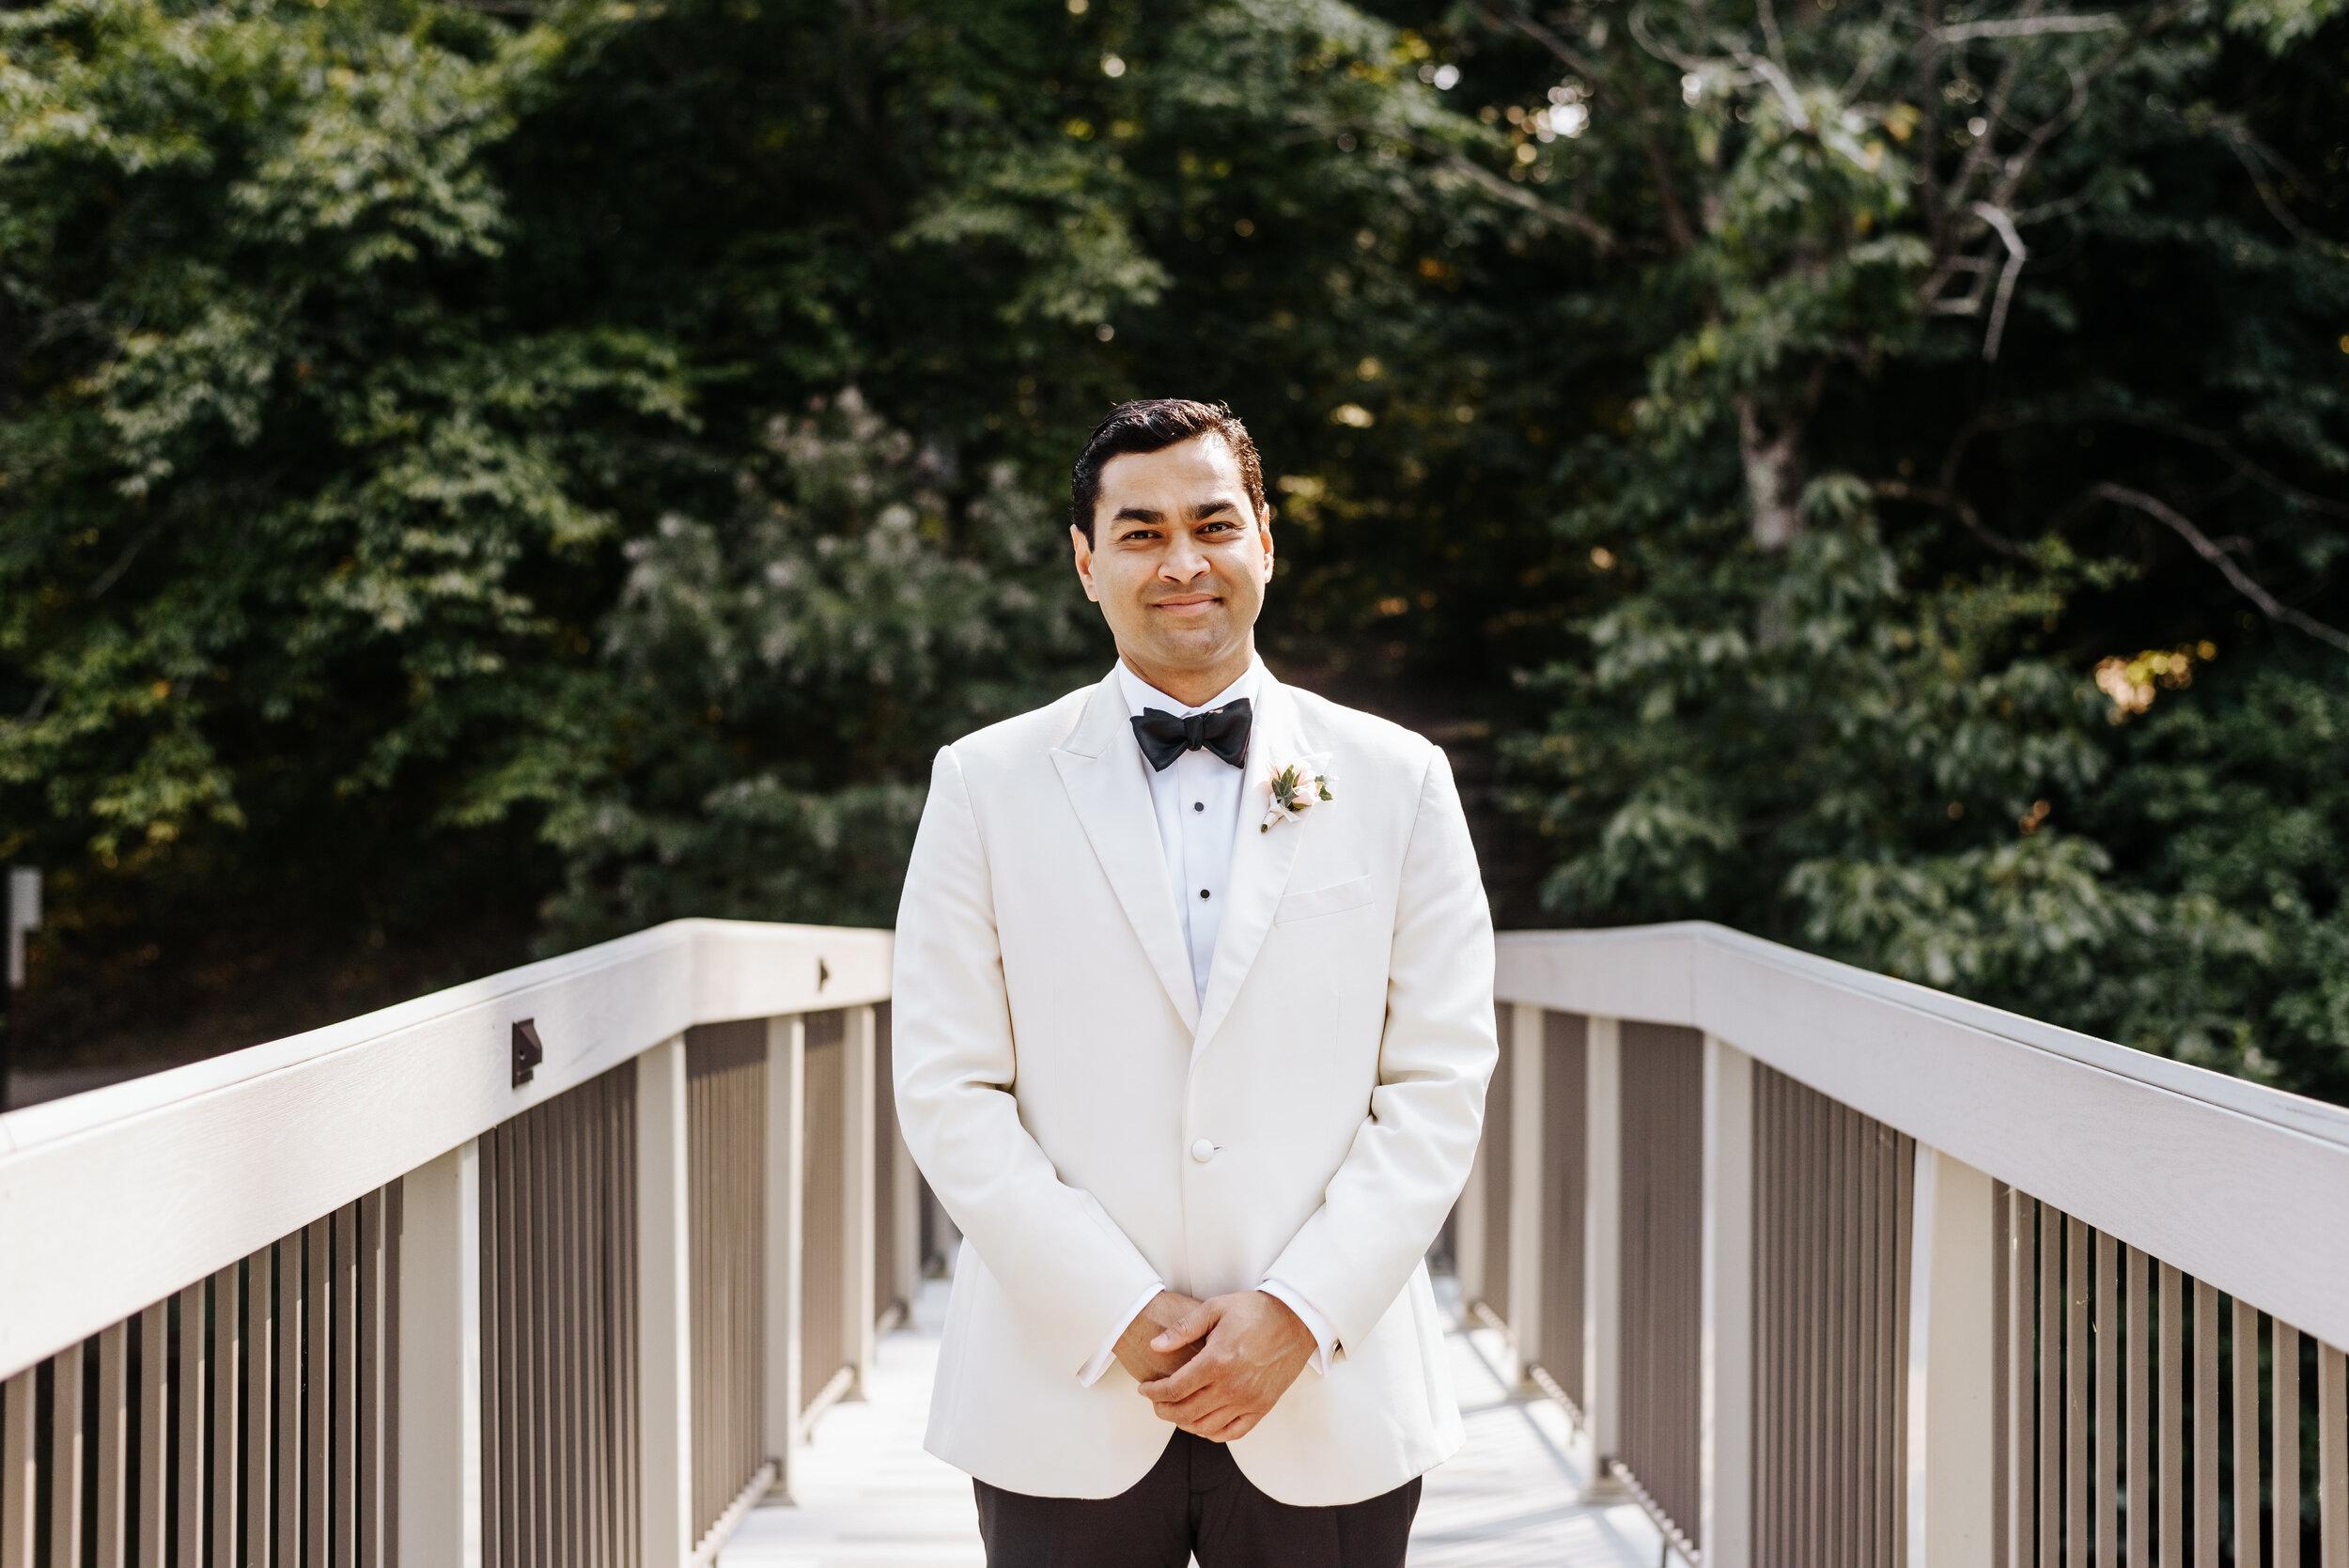 Cassie-Mrunal-Wedding-Quirk-Hotel-John-Marshall-Ballrooms-Richmond-Virginia-Photography-by-V-35.jpg